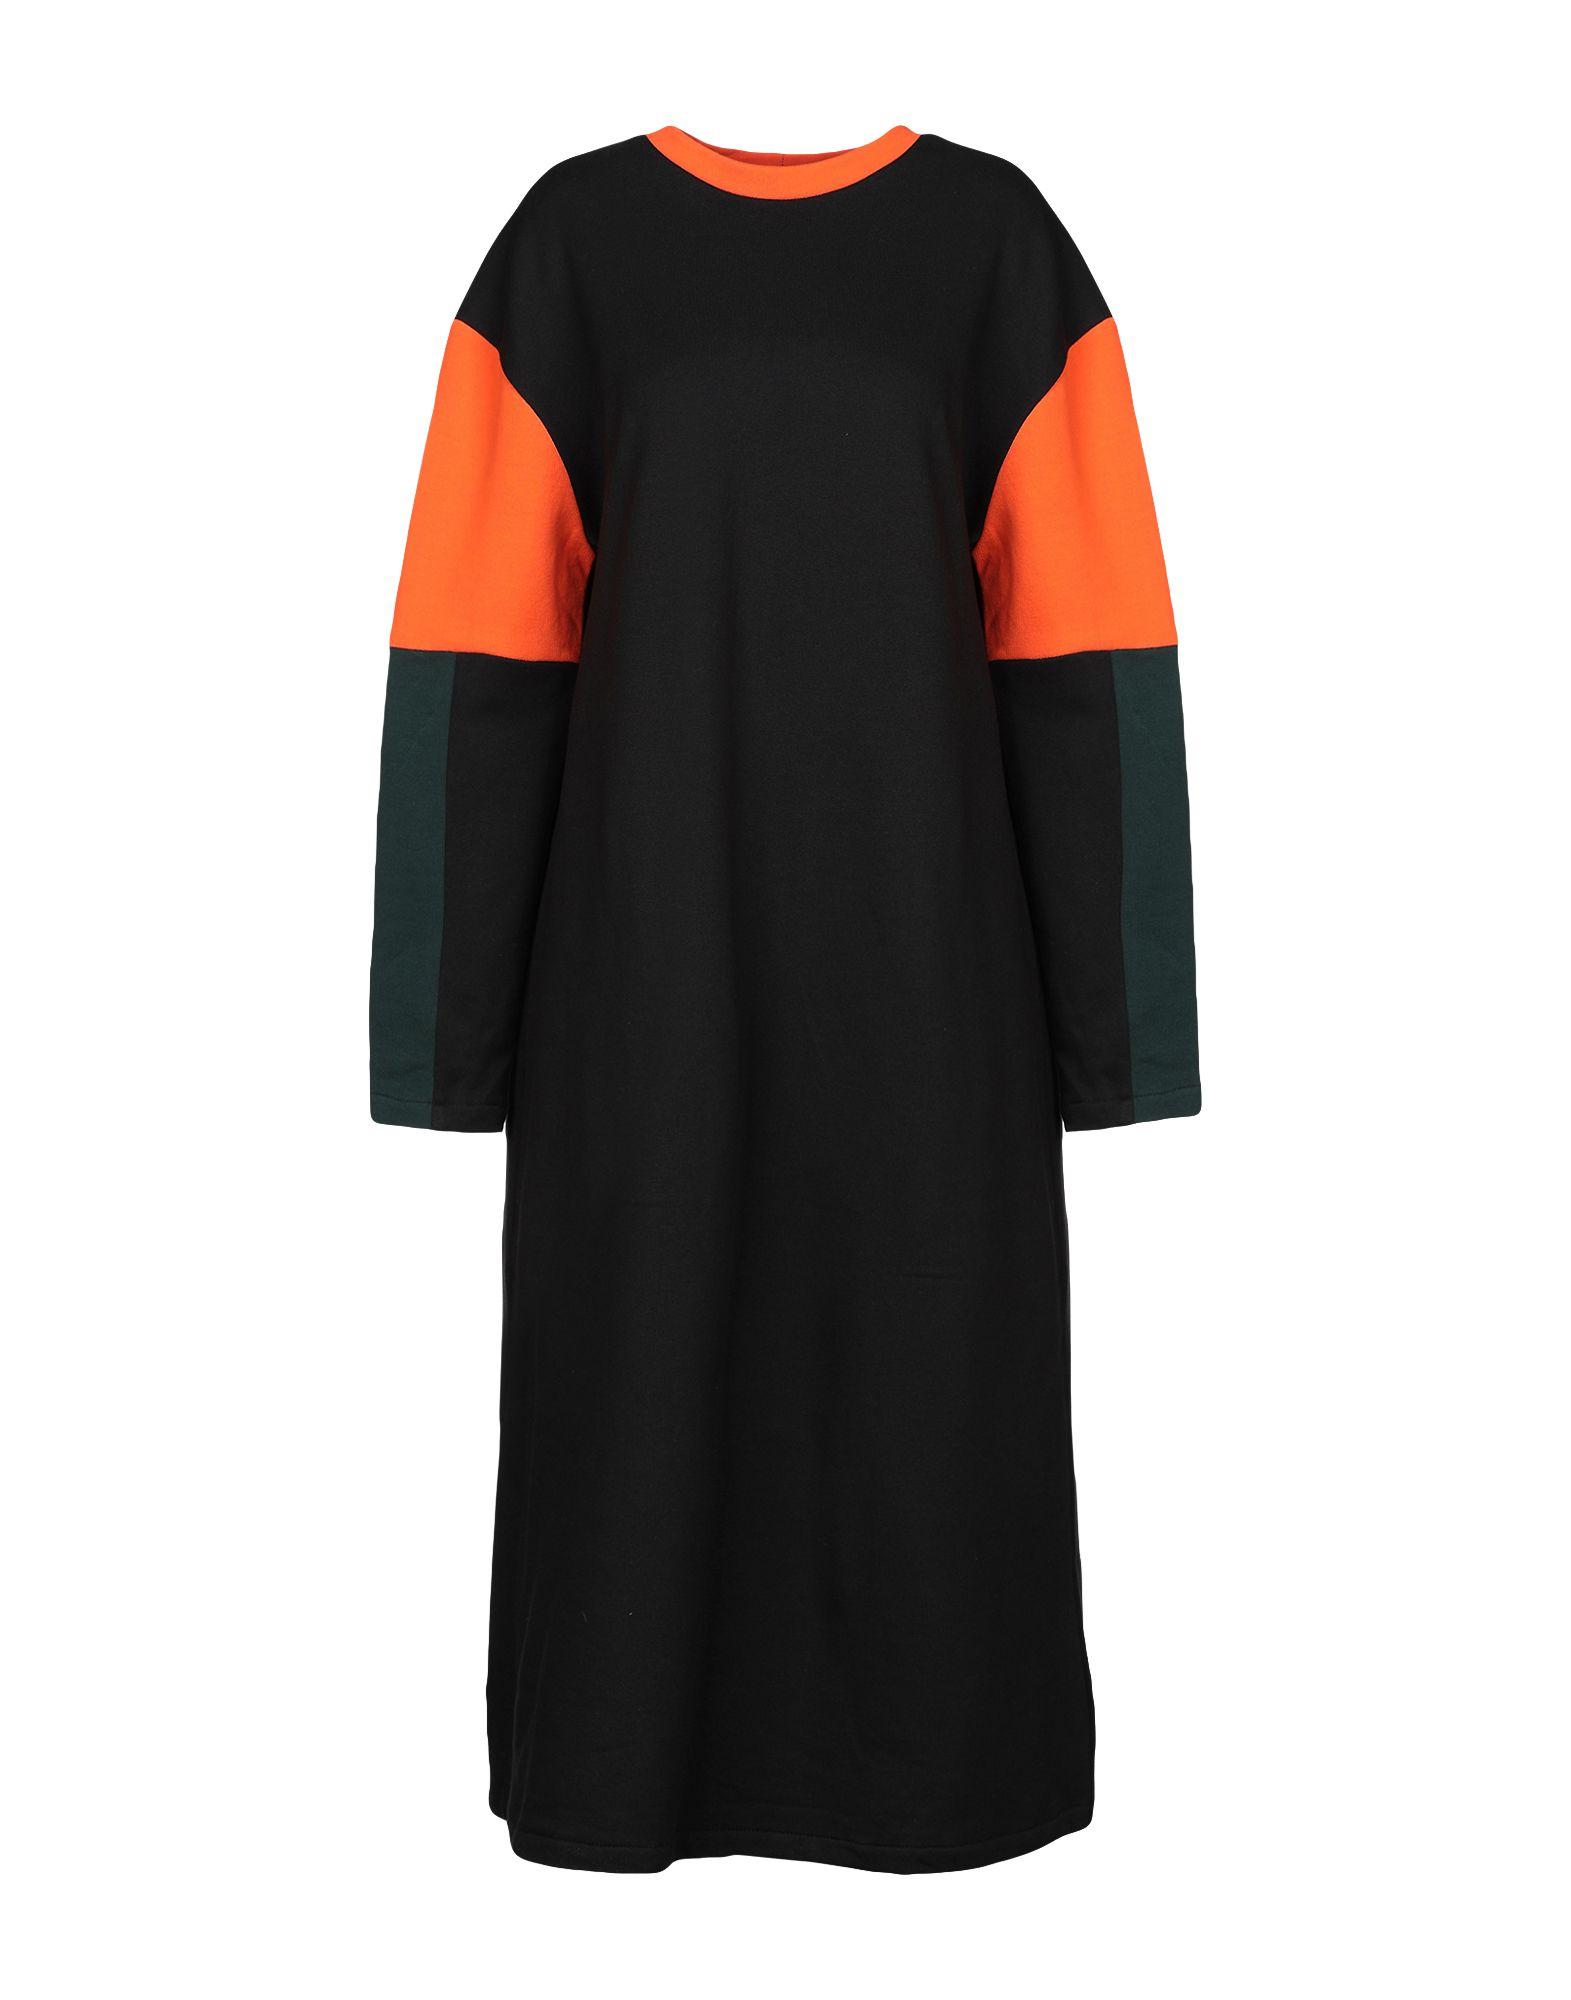 Фото - RIYKA Платье длиной 3/4 riyka топ без рукавов